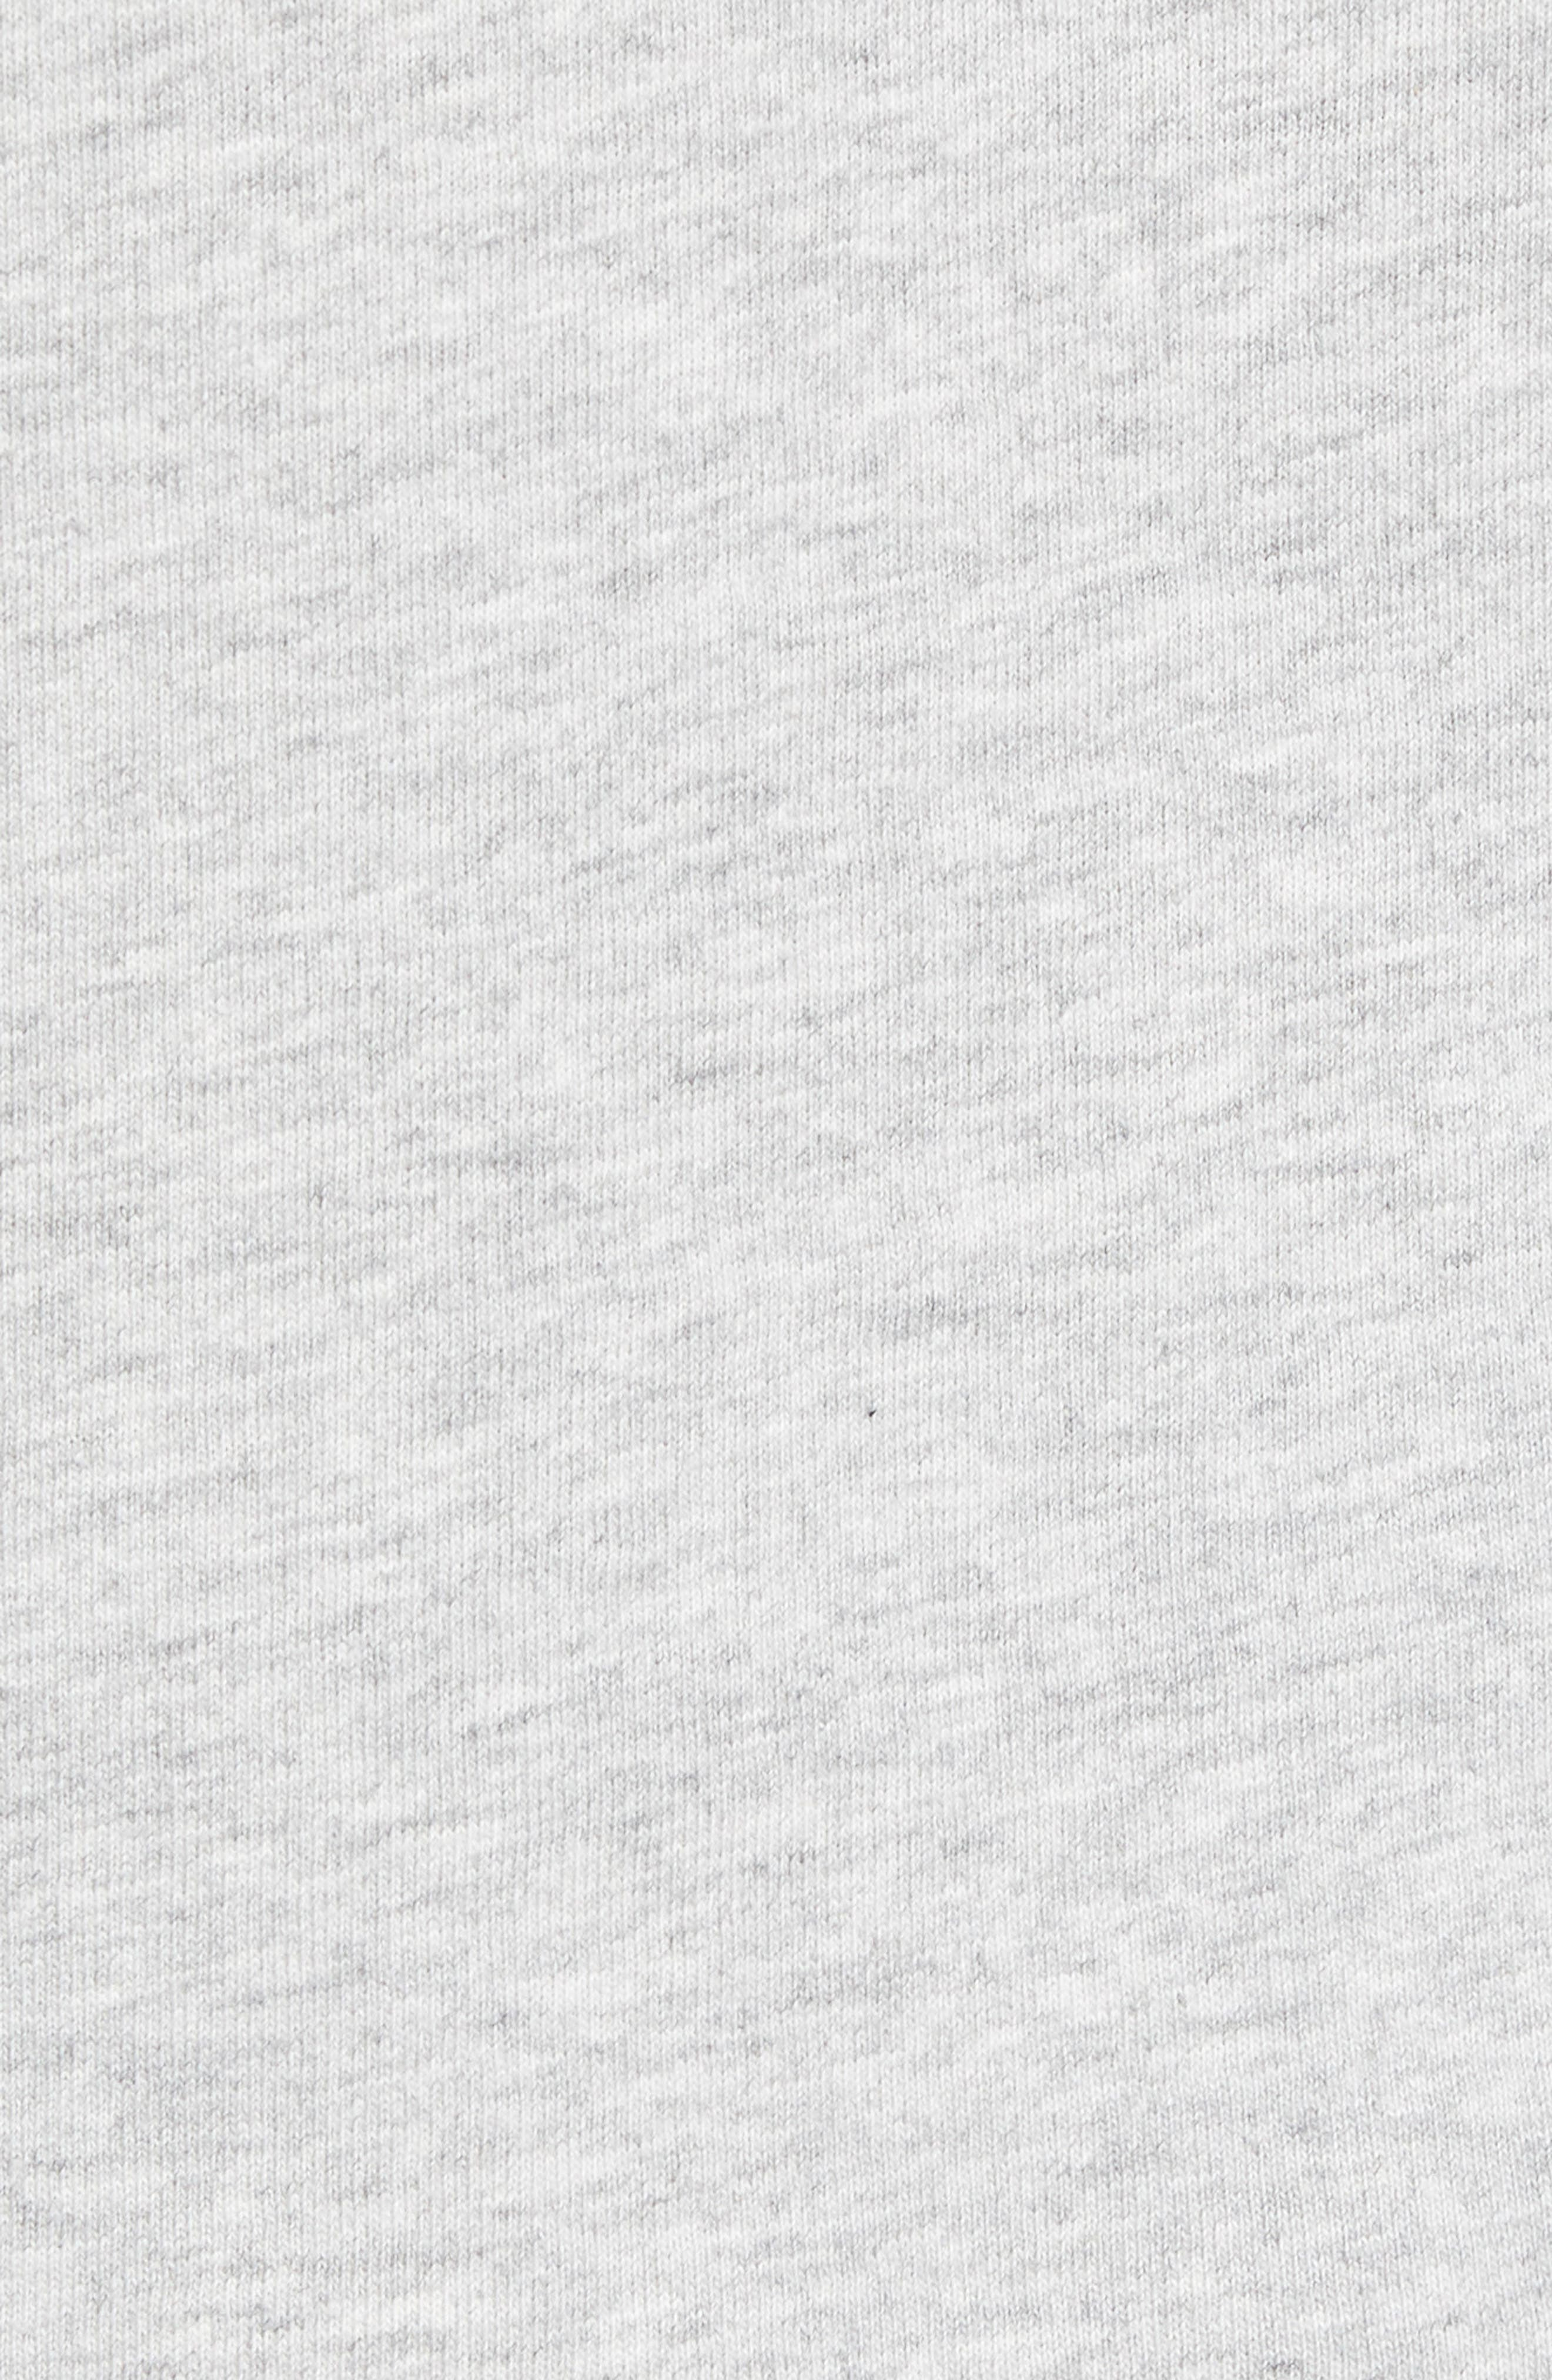 Marlin 98 Long Sleeve Pocket T-Shirt,                             Alternate thumbnail 5, color,                             Gray Heather